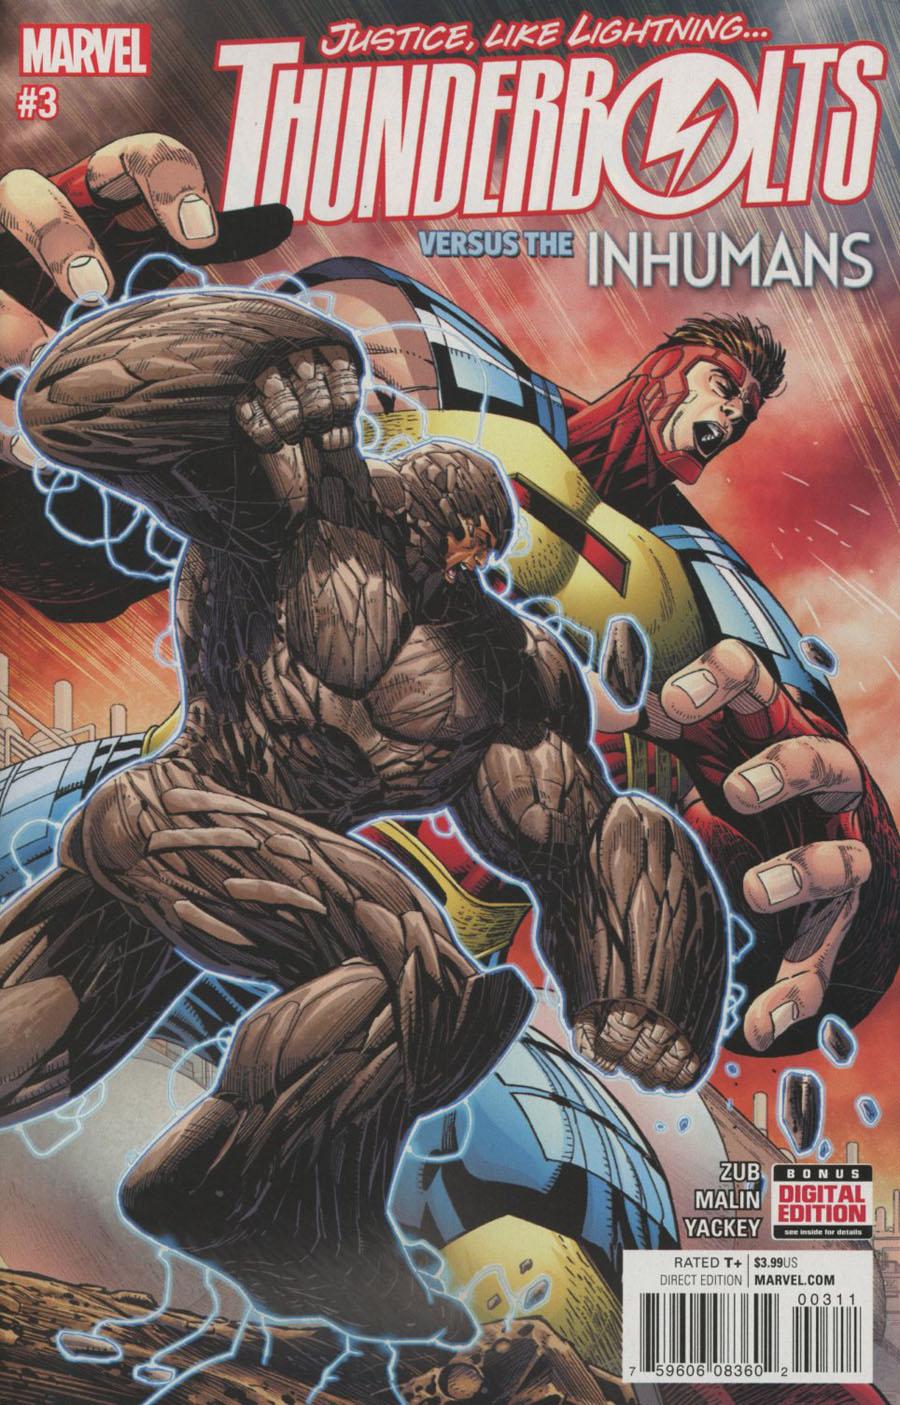 Thunderbolts Vol 3 #3 Cover A Regular Jon Malin Cover